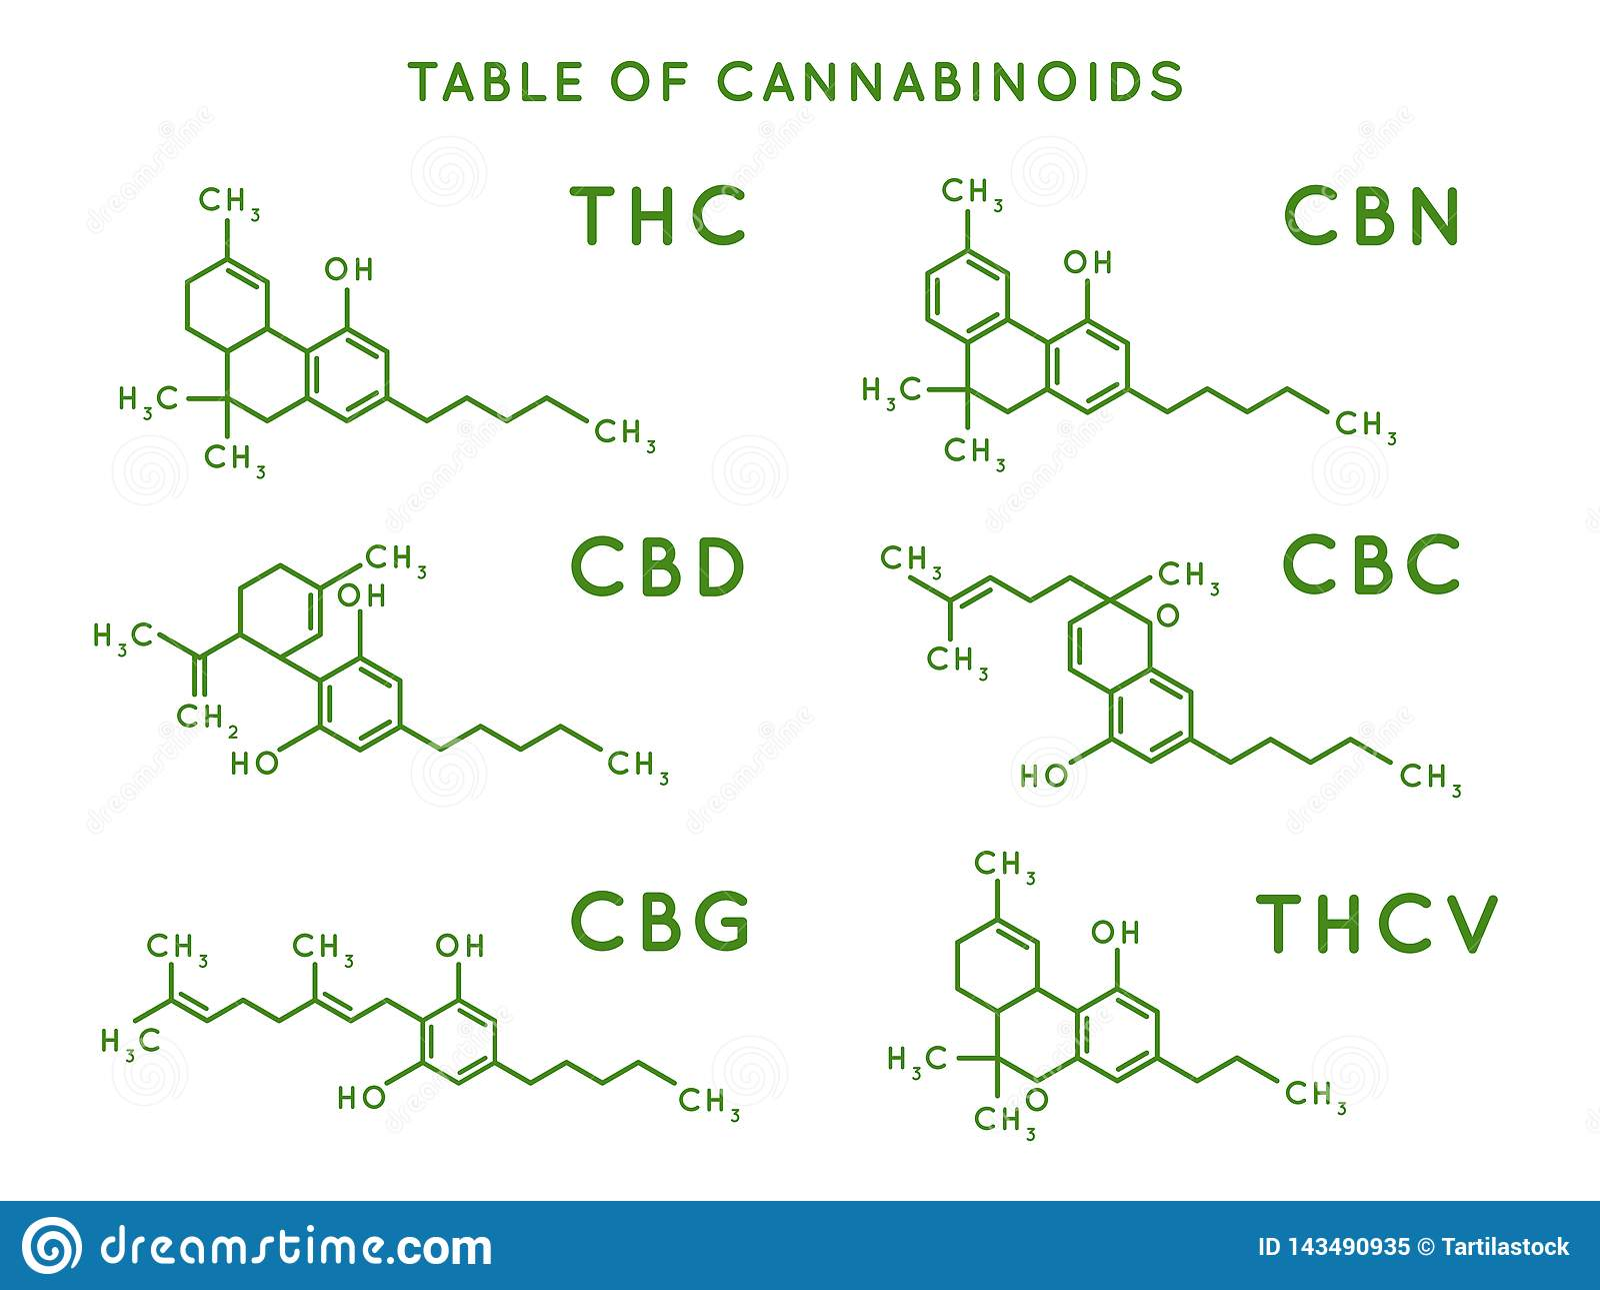 Cannabinoid structure. Cannabidiol molecular structures, THC and CBD formula. Marijuana or cannabis molecules vector